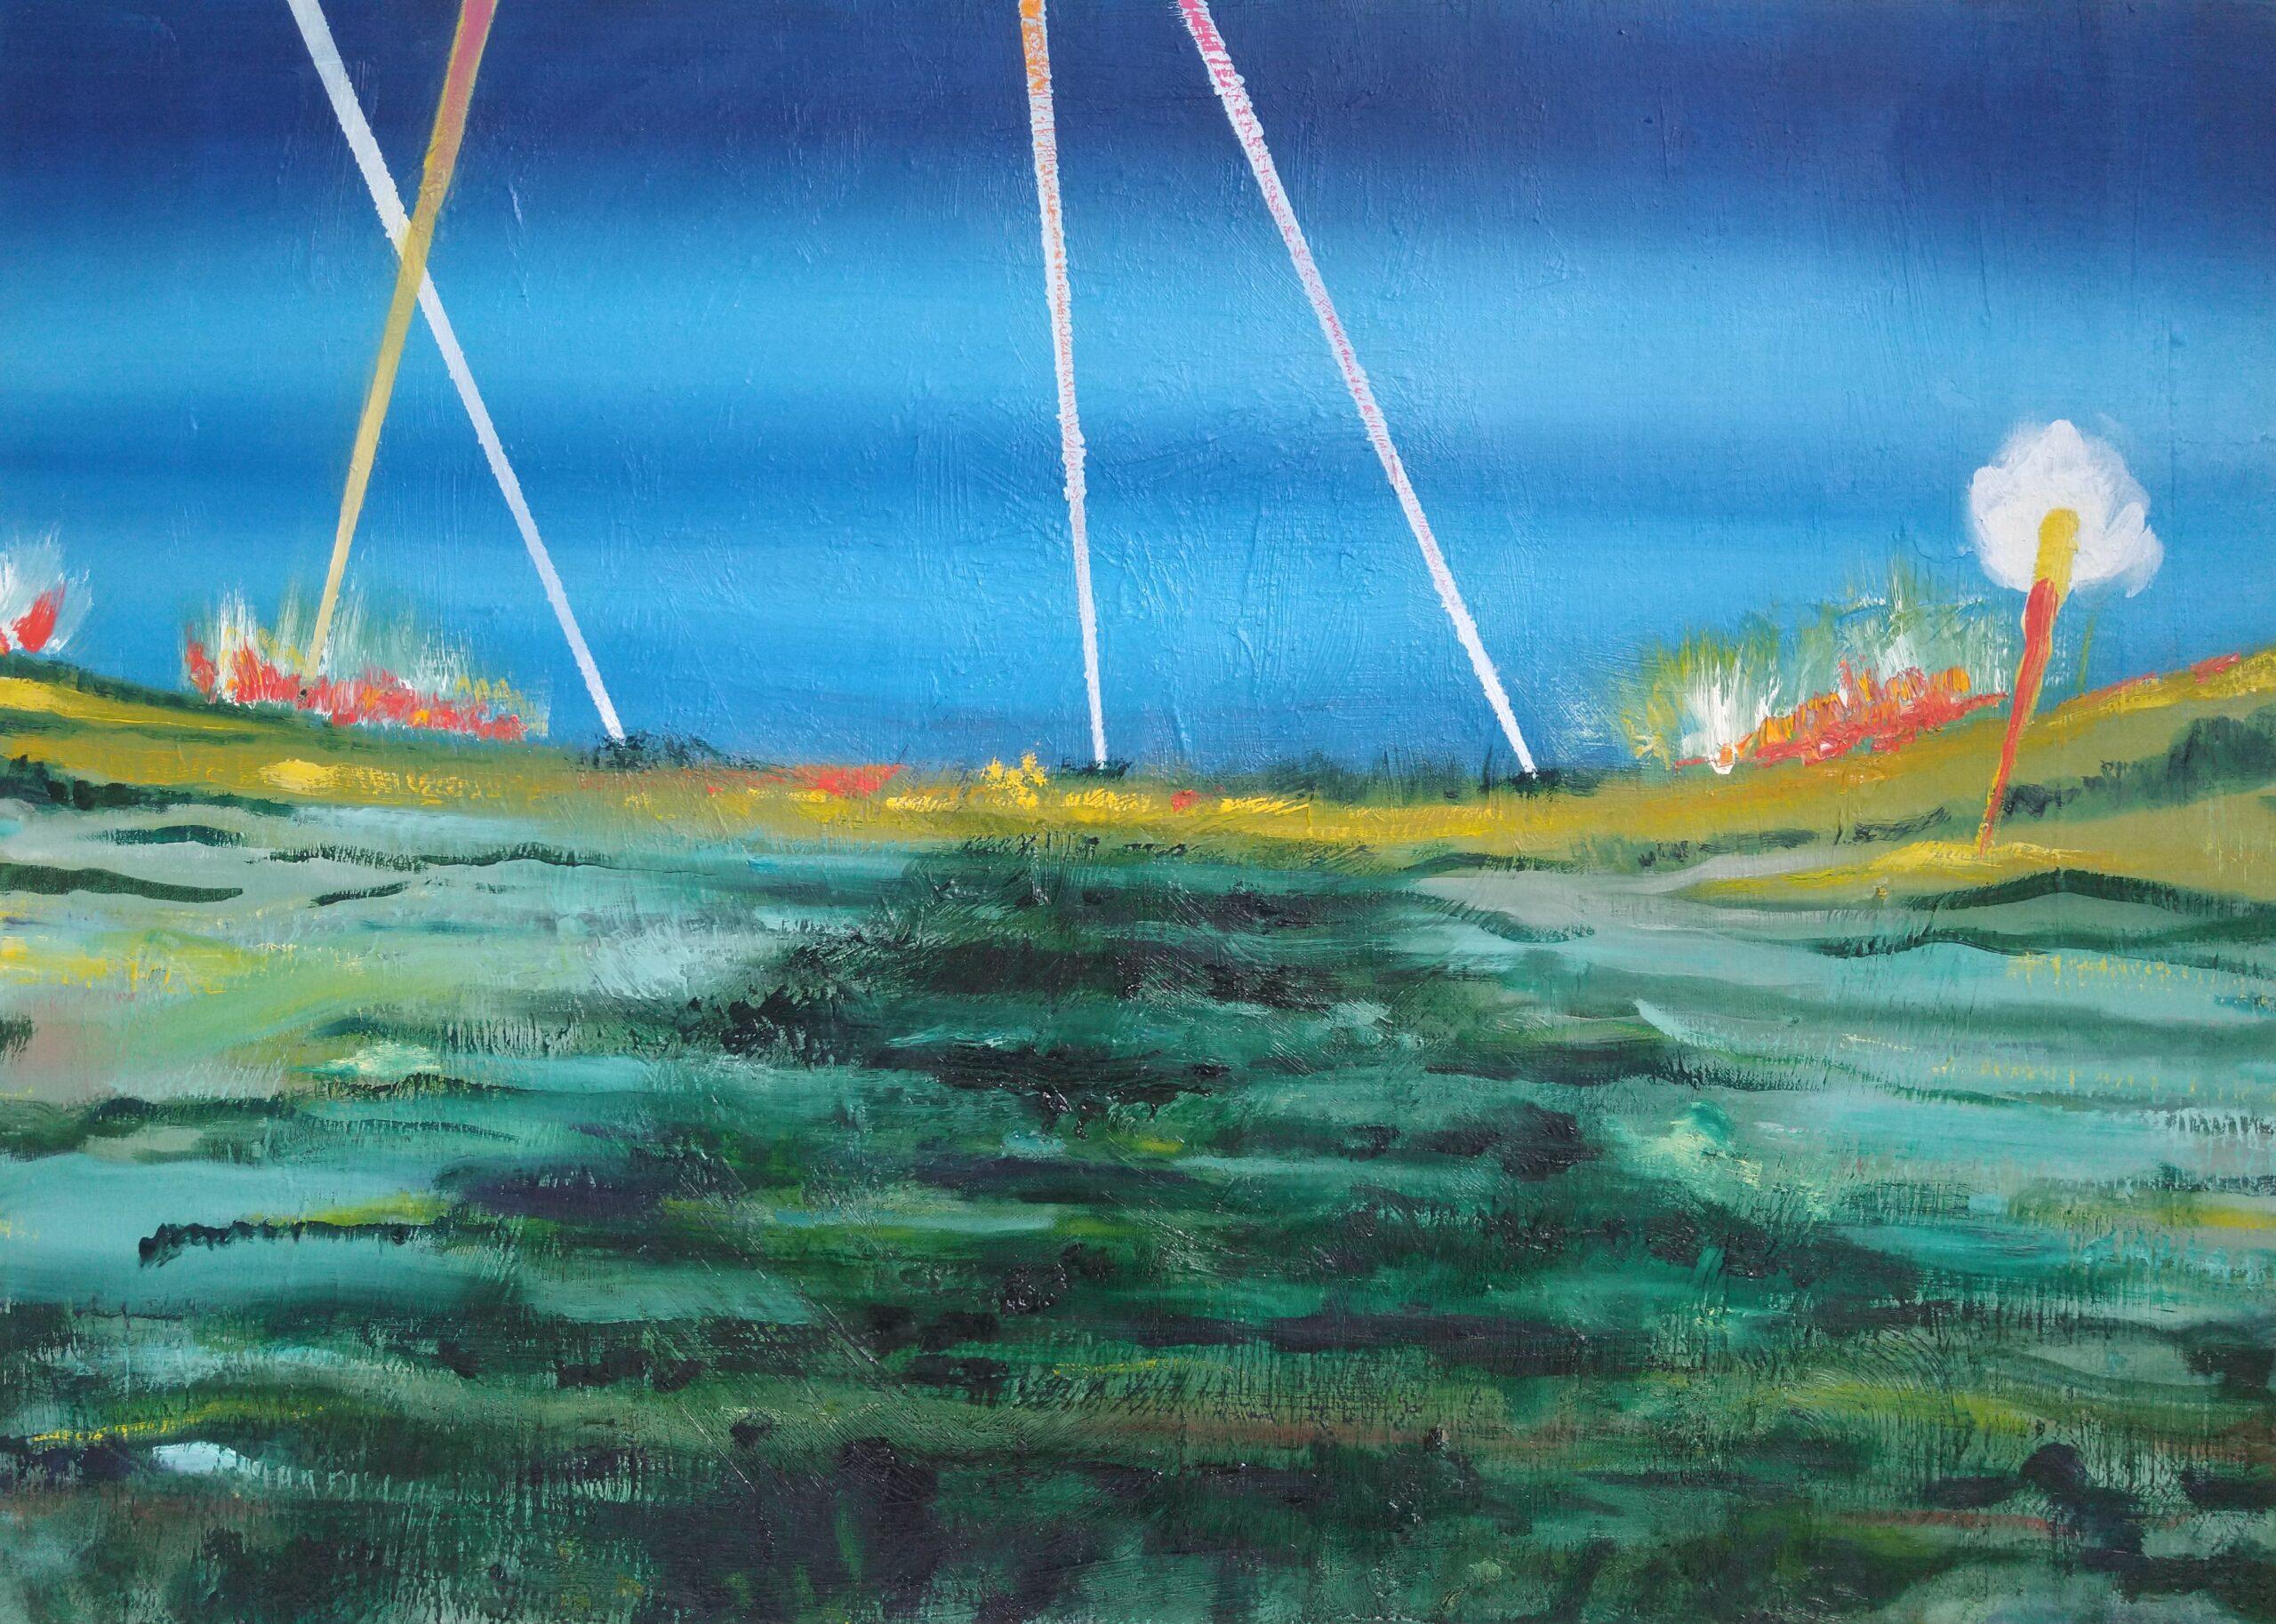 Wouter van de Koot painting battlefield searchlight landscape lights sky